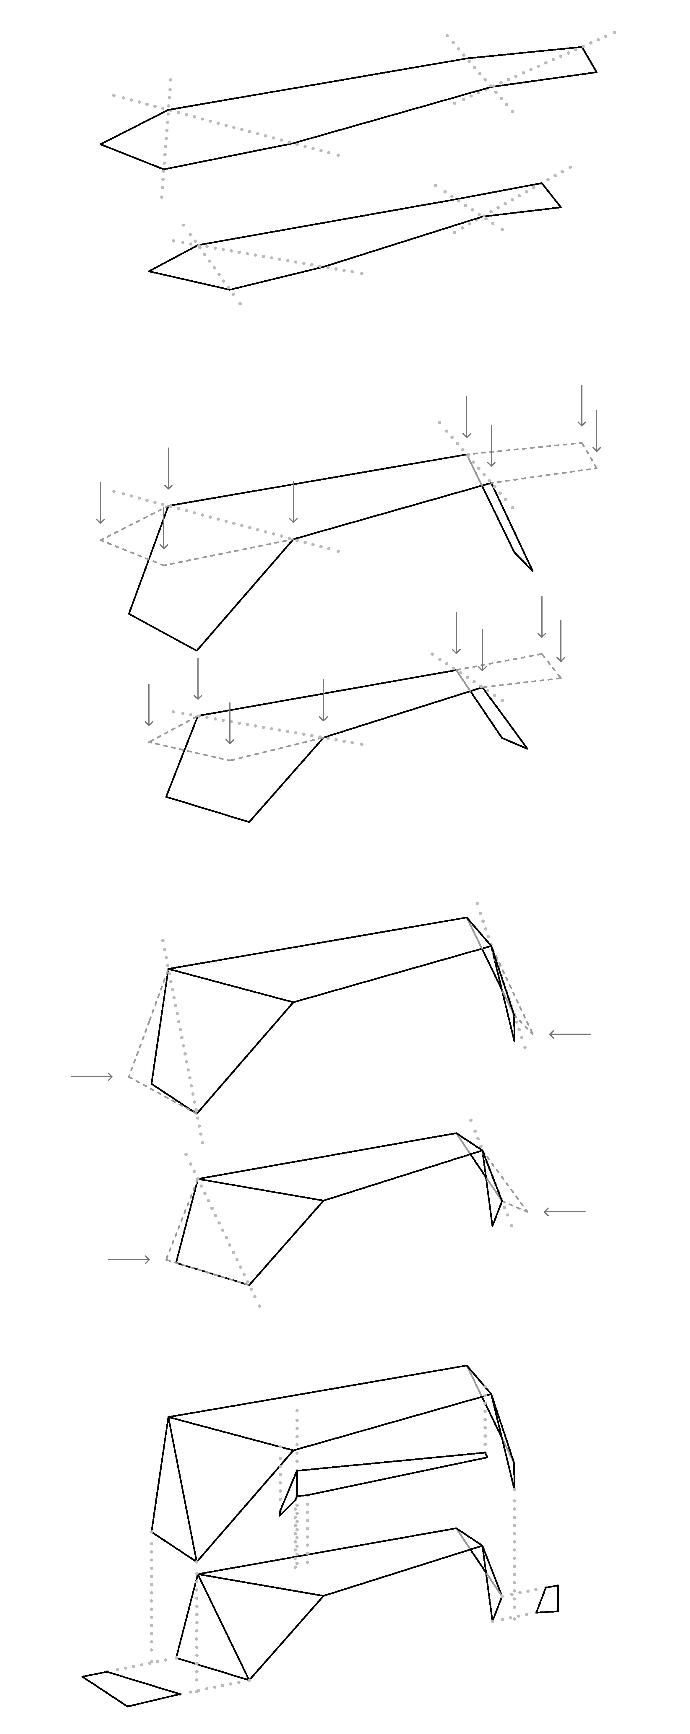 NOVAE FOLDONE unfolding diagram